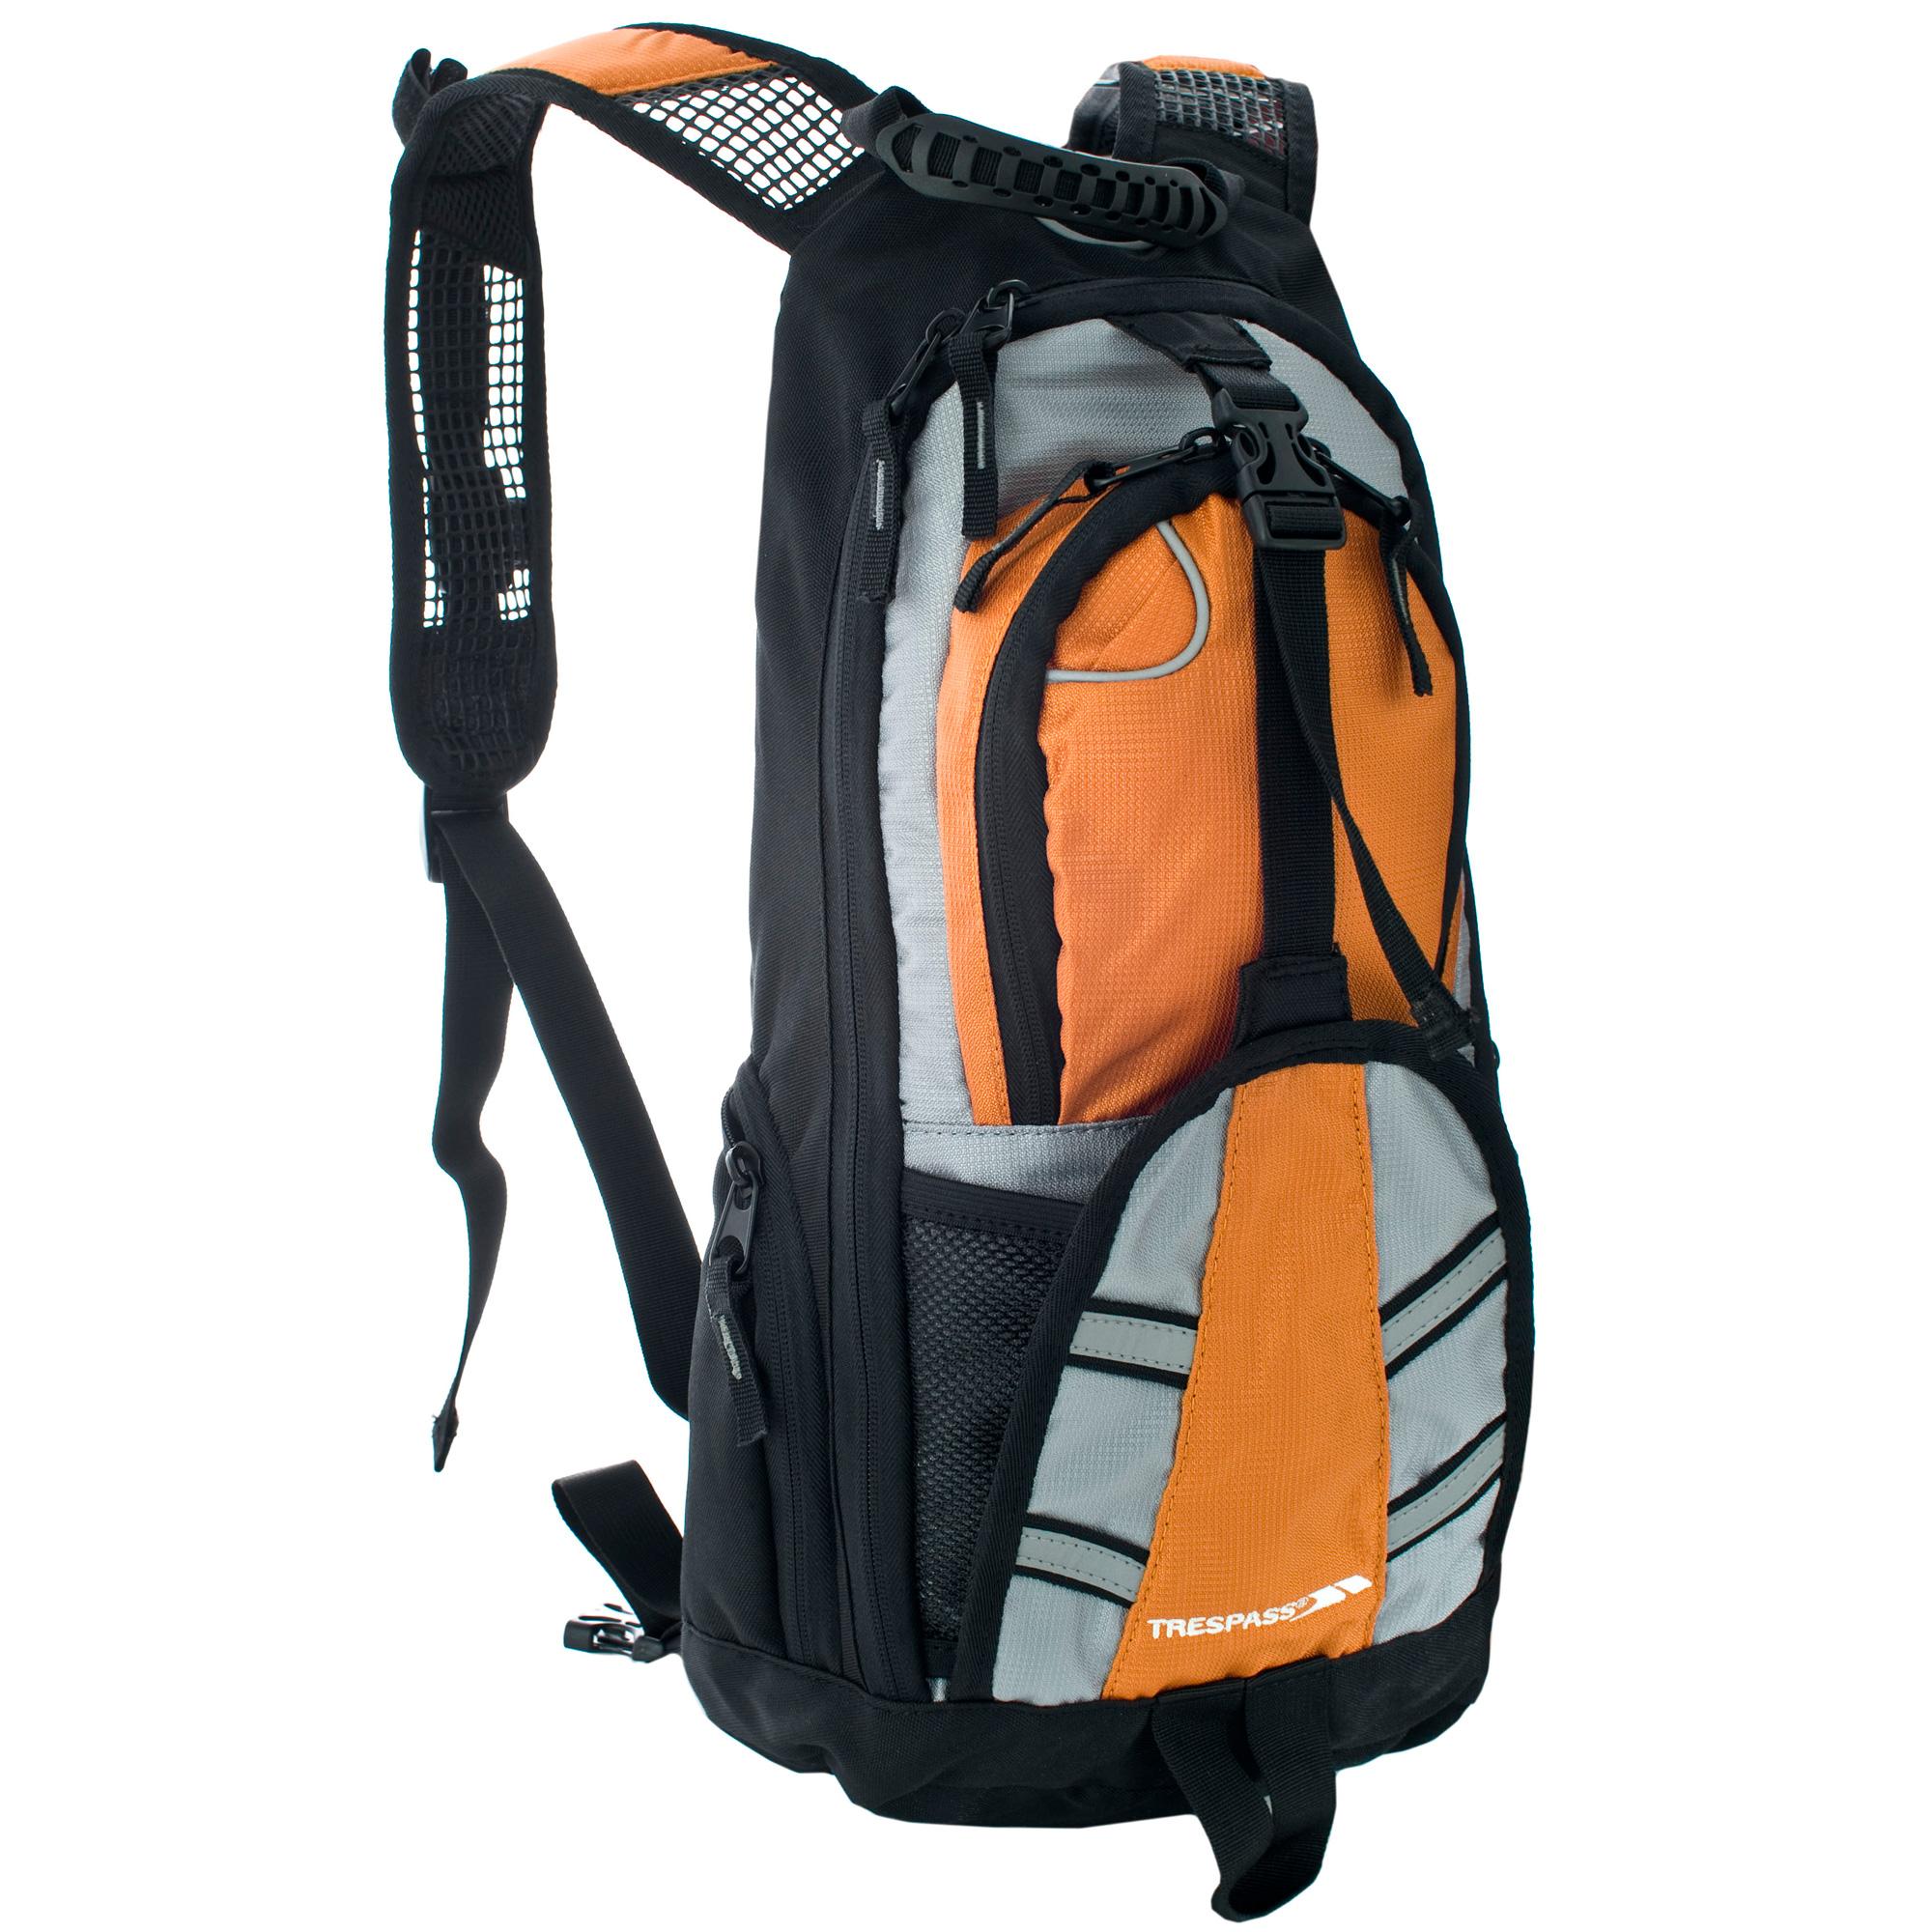 Trespass Survey Hydration Running Backpack